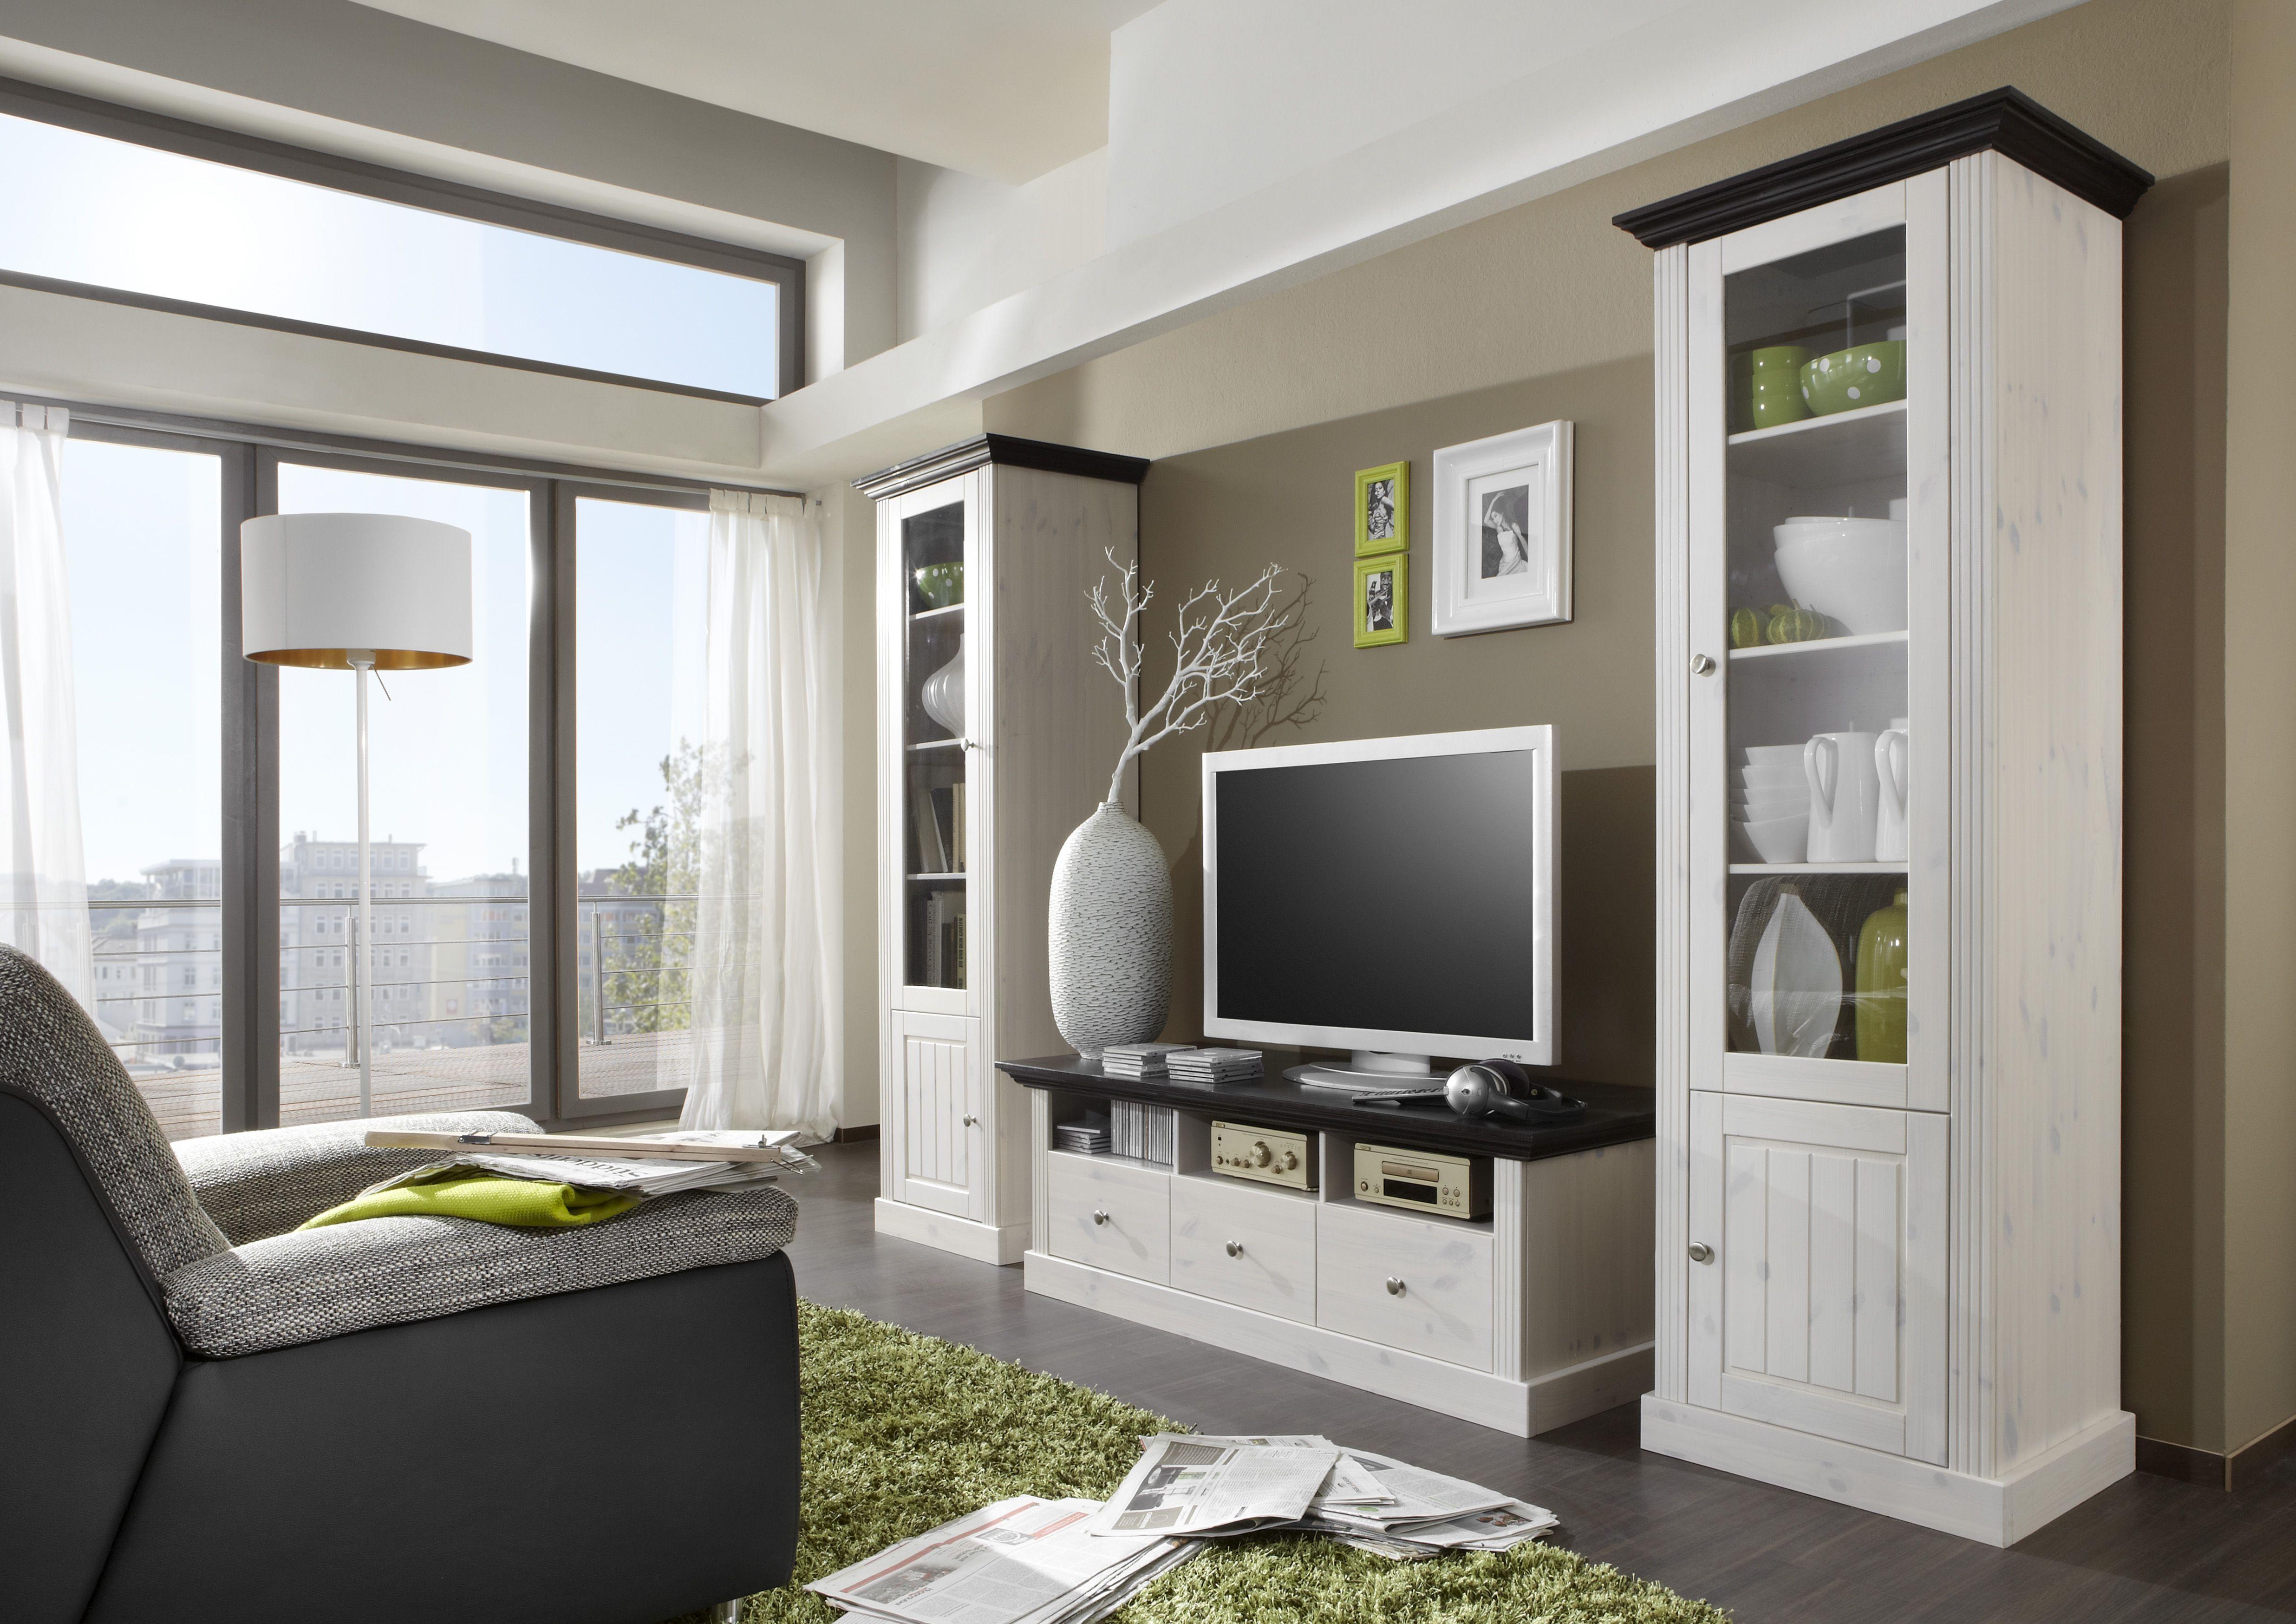 bedroom tv unit furniture. bedroom tv unit furniture   design ideas 2017 2018   Pinterest